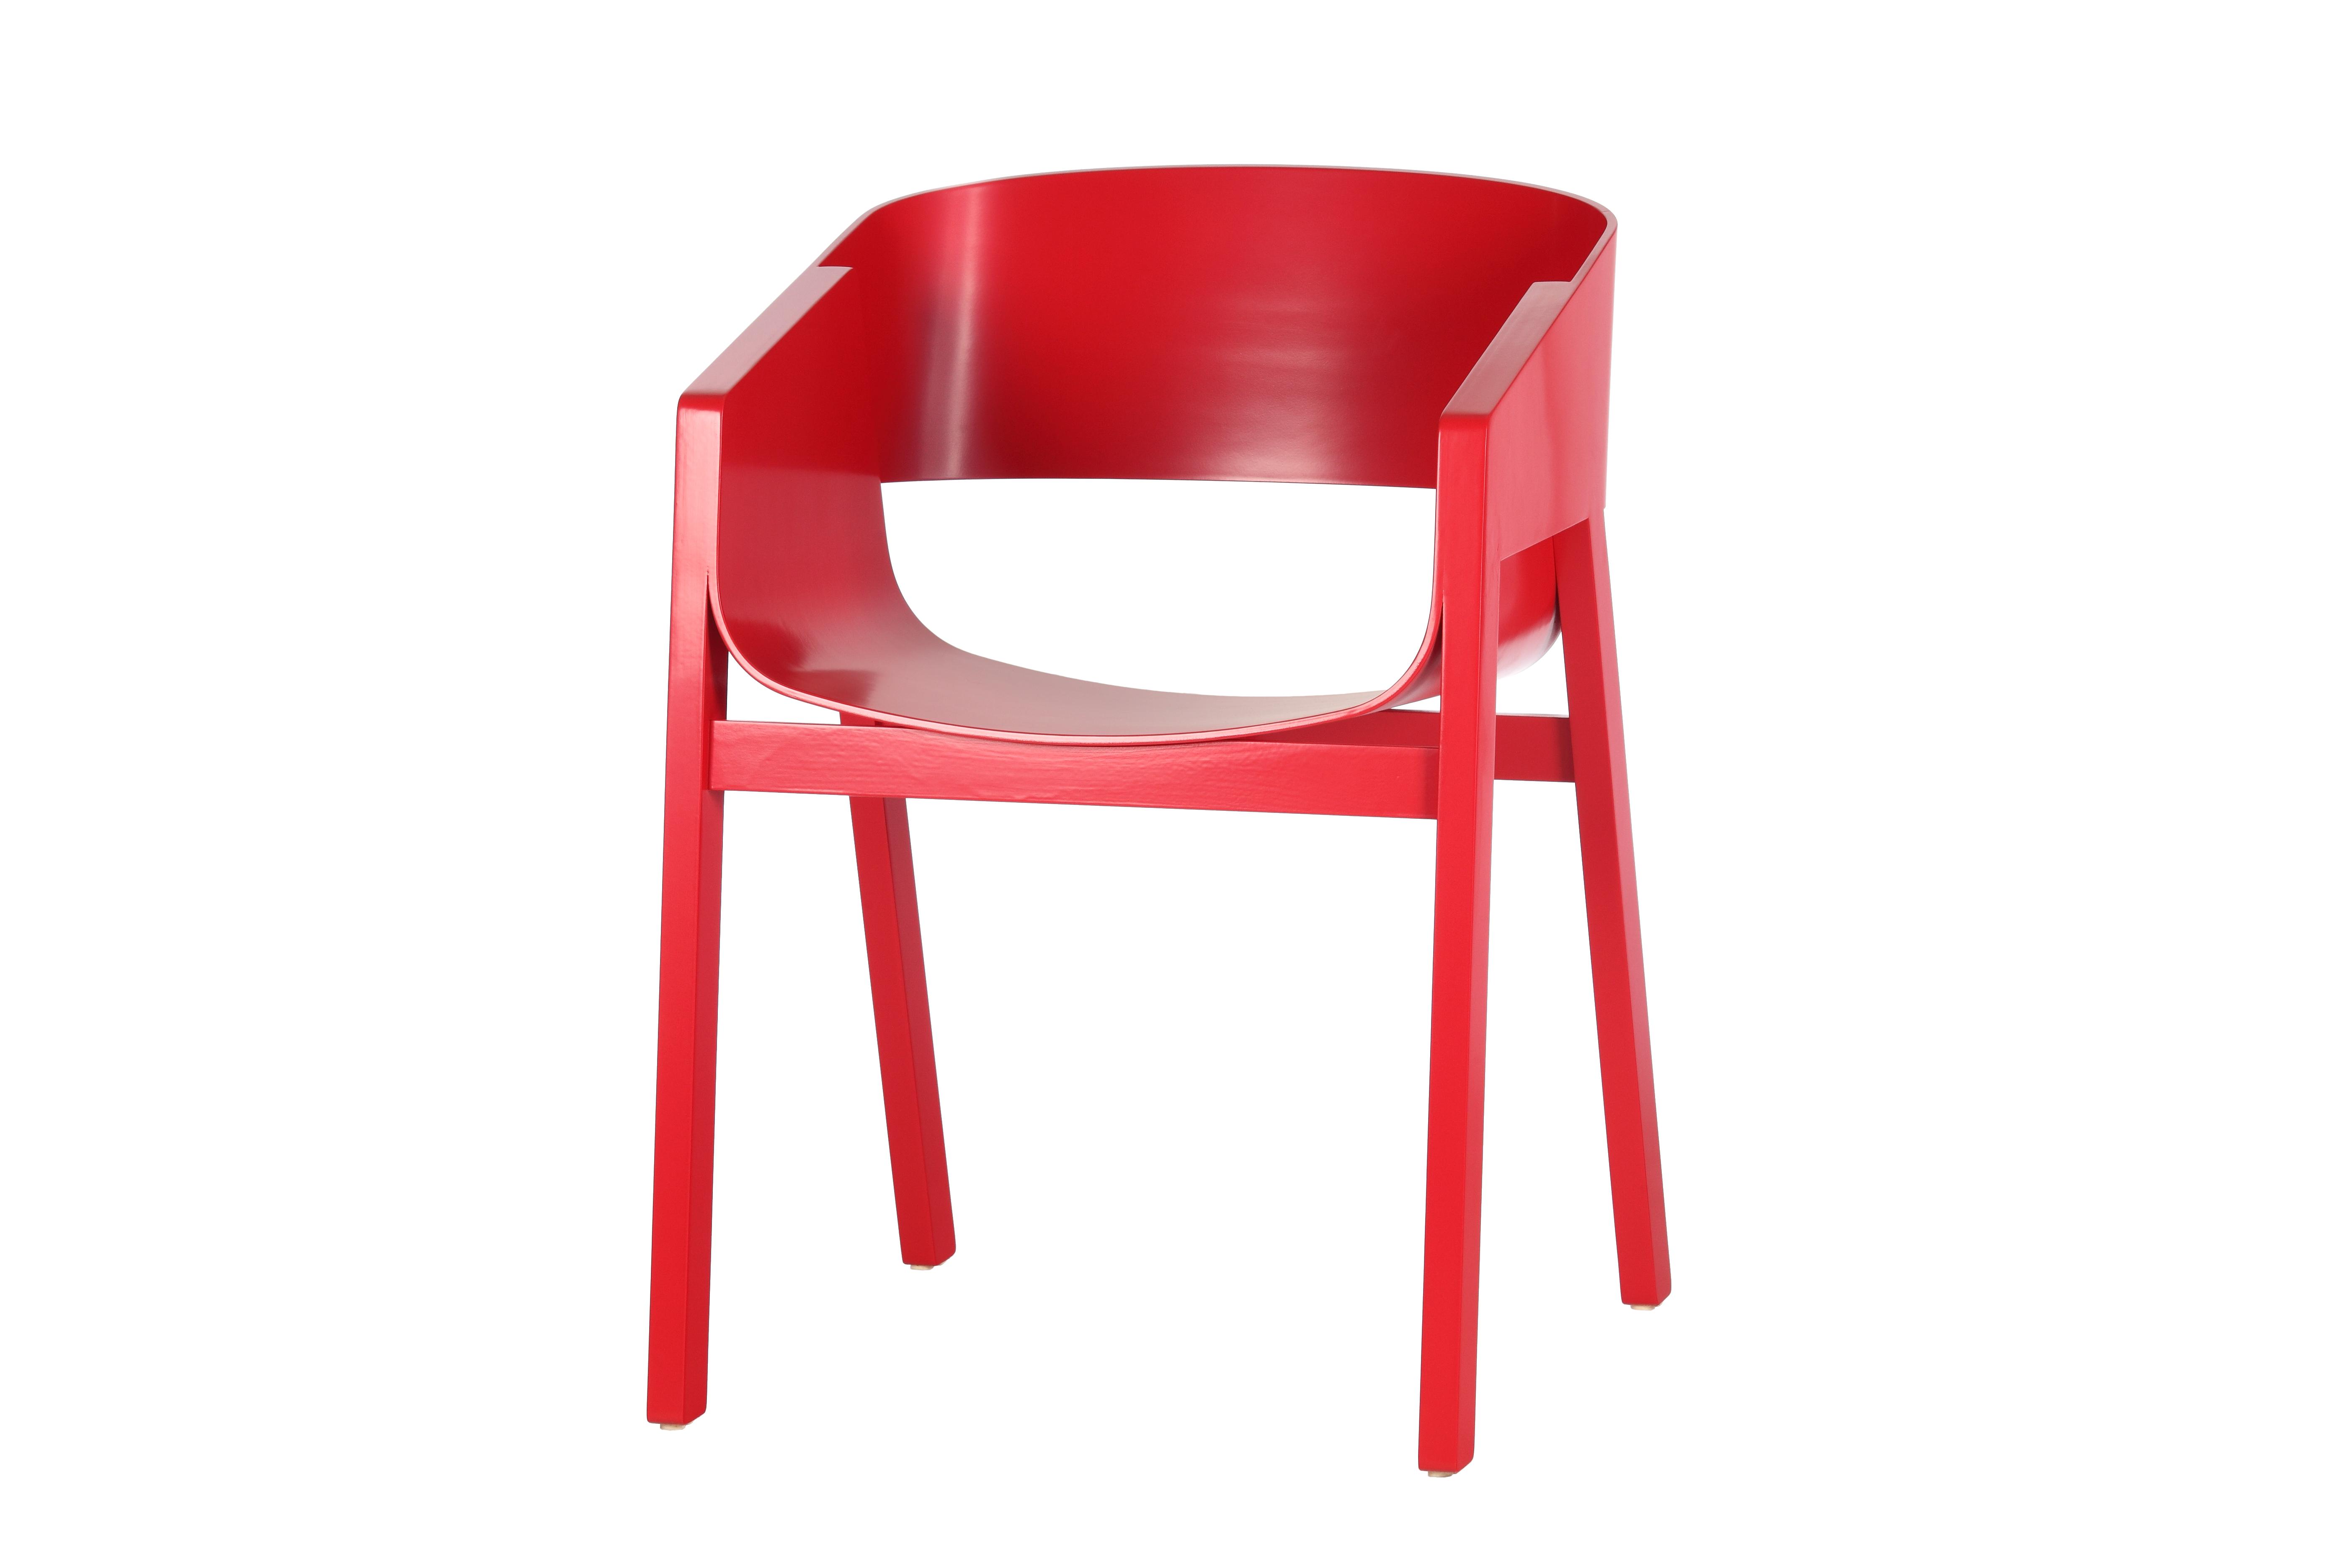 Scaun din lemn de stejar Merano Red, l47,5xA39xH78 cm